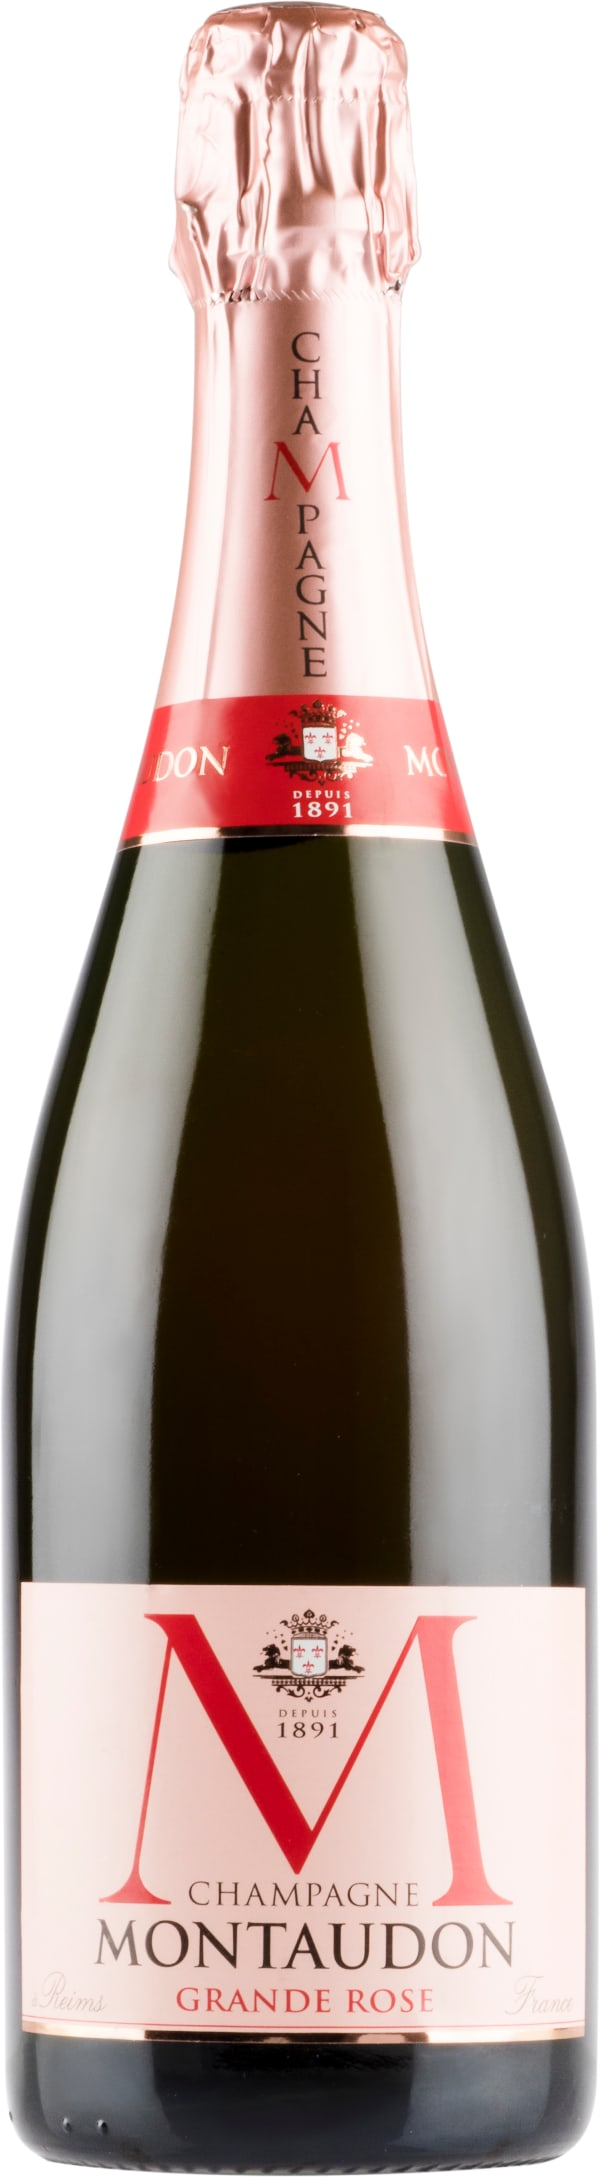 Montaudon Grand Rosé Champagne Brut